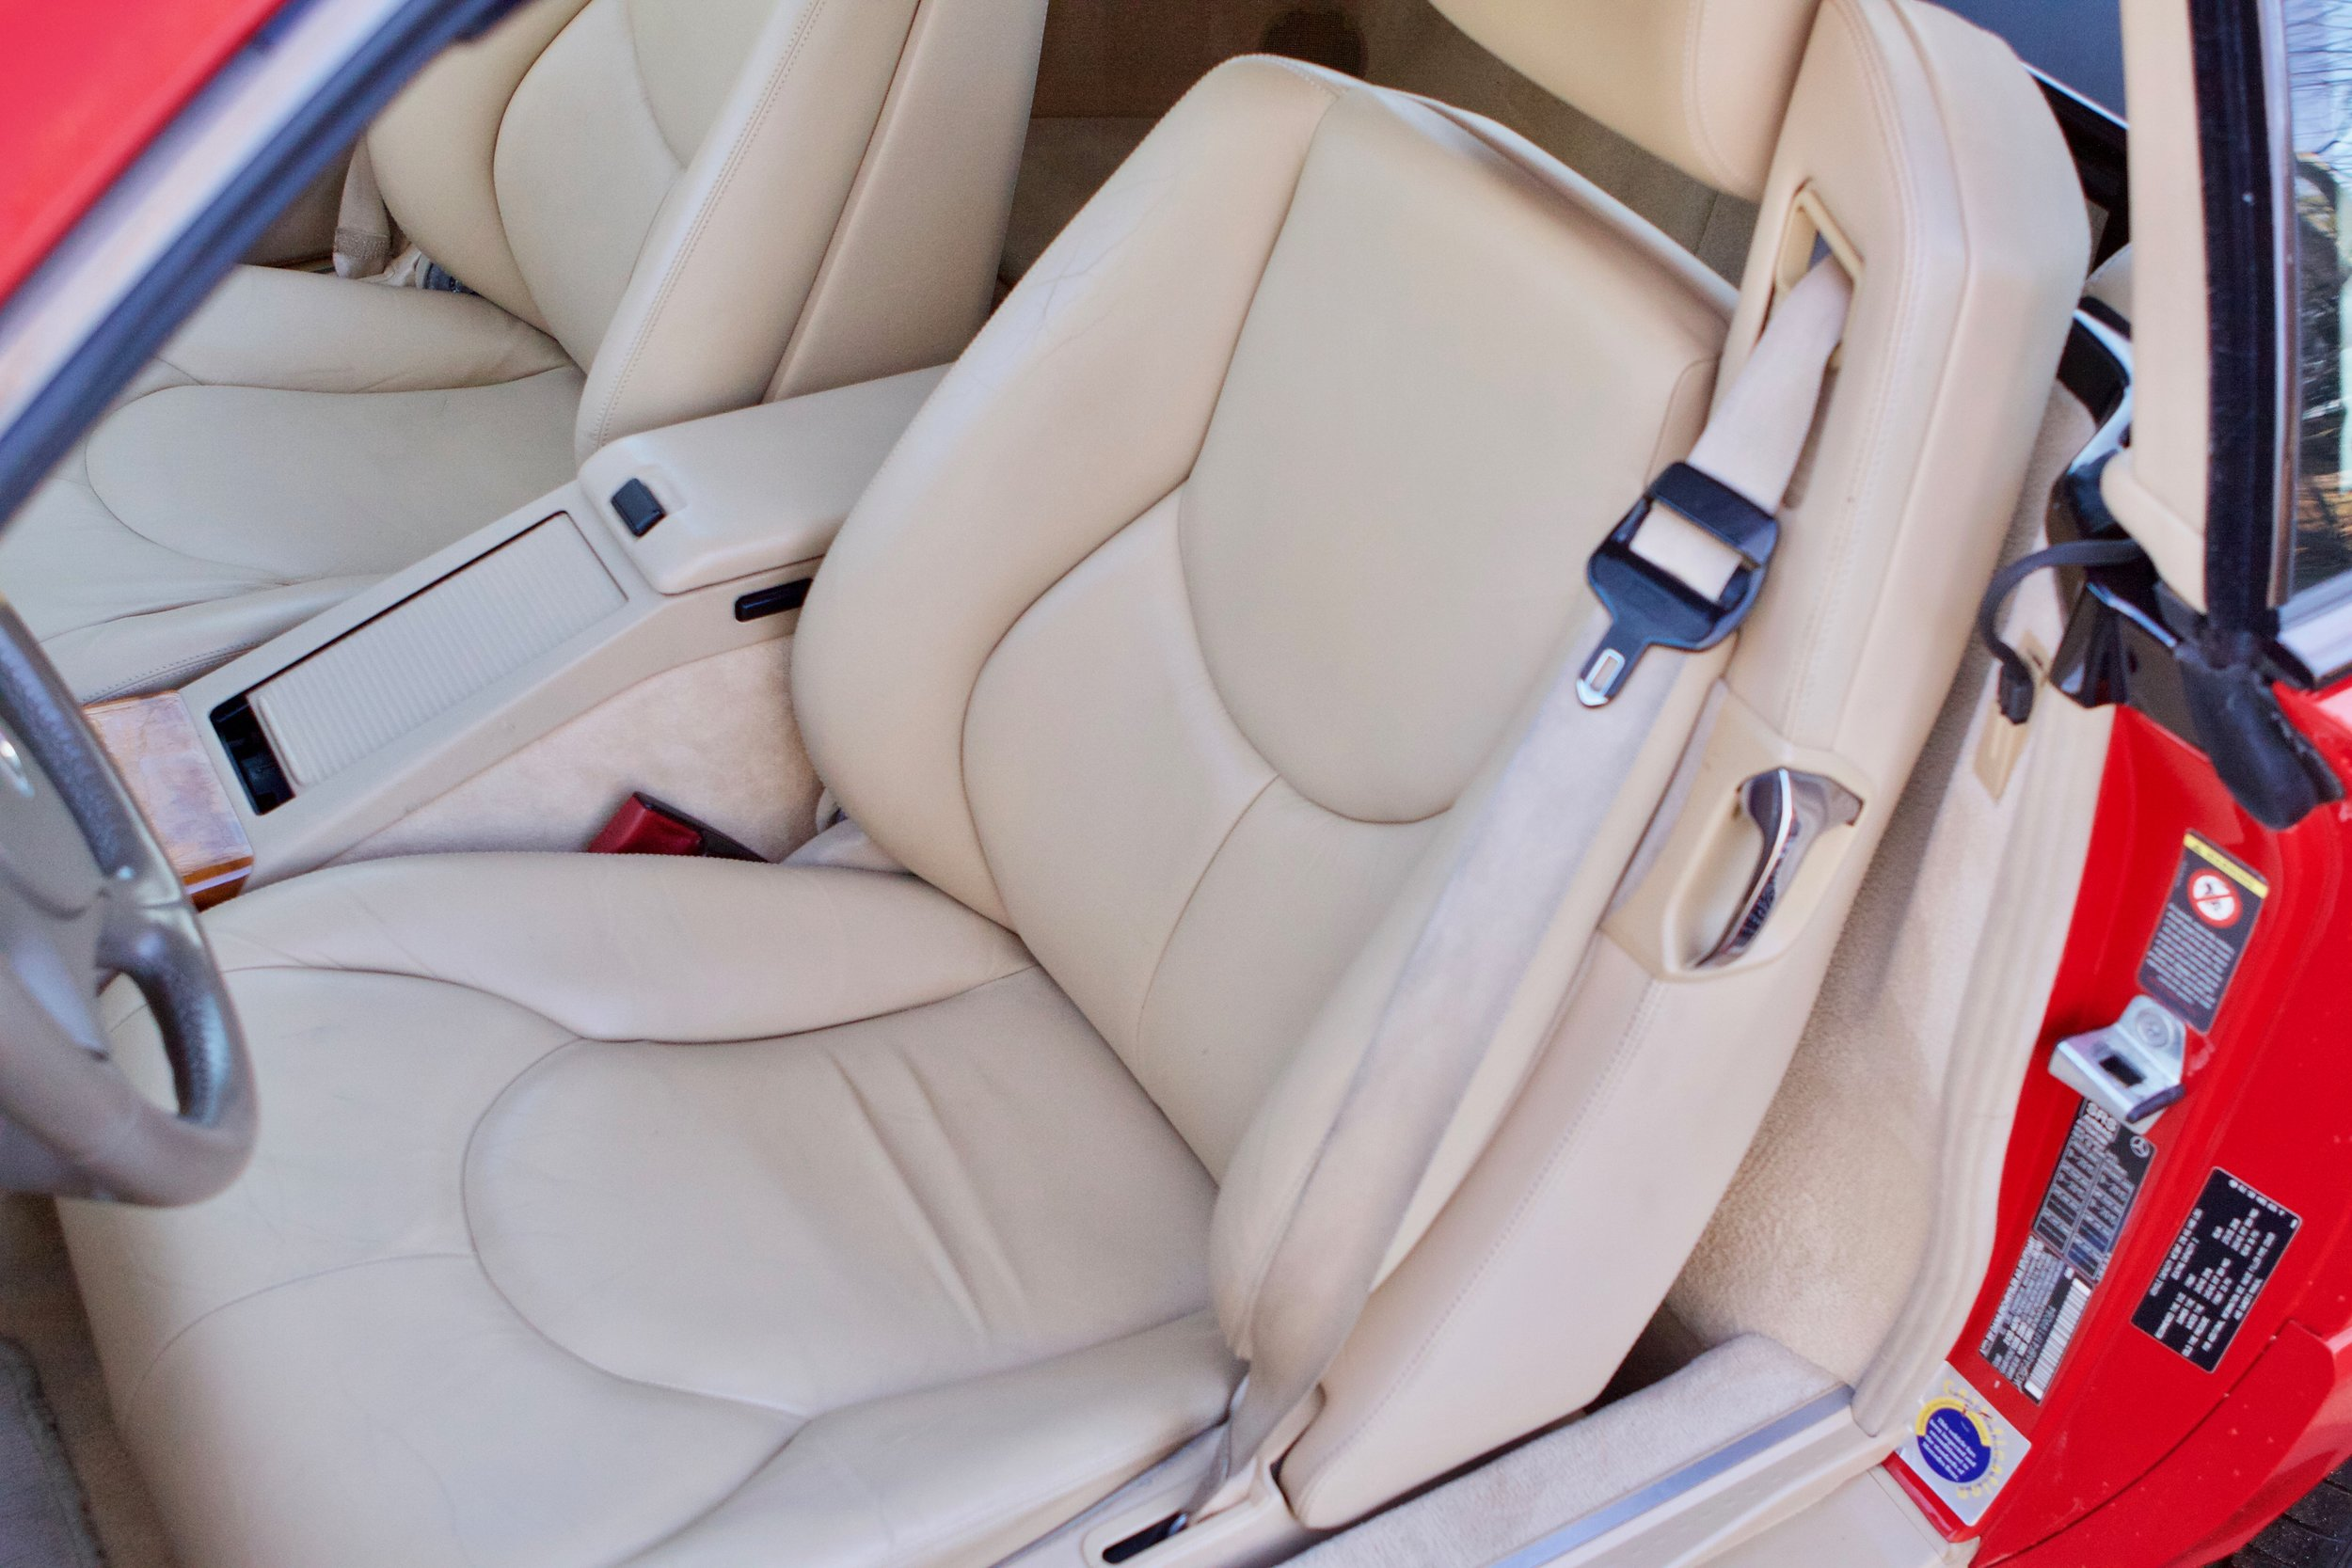 20190504 VIN199084 2001 500SL AMG - 20.jpg